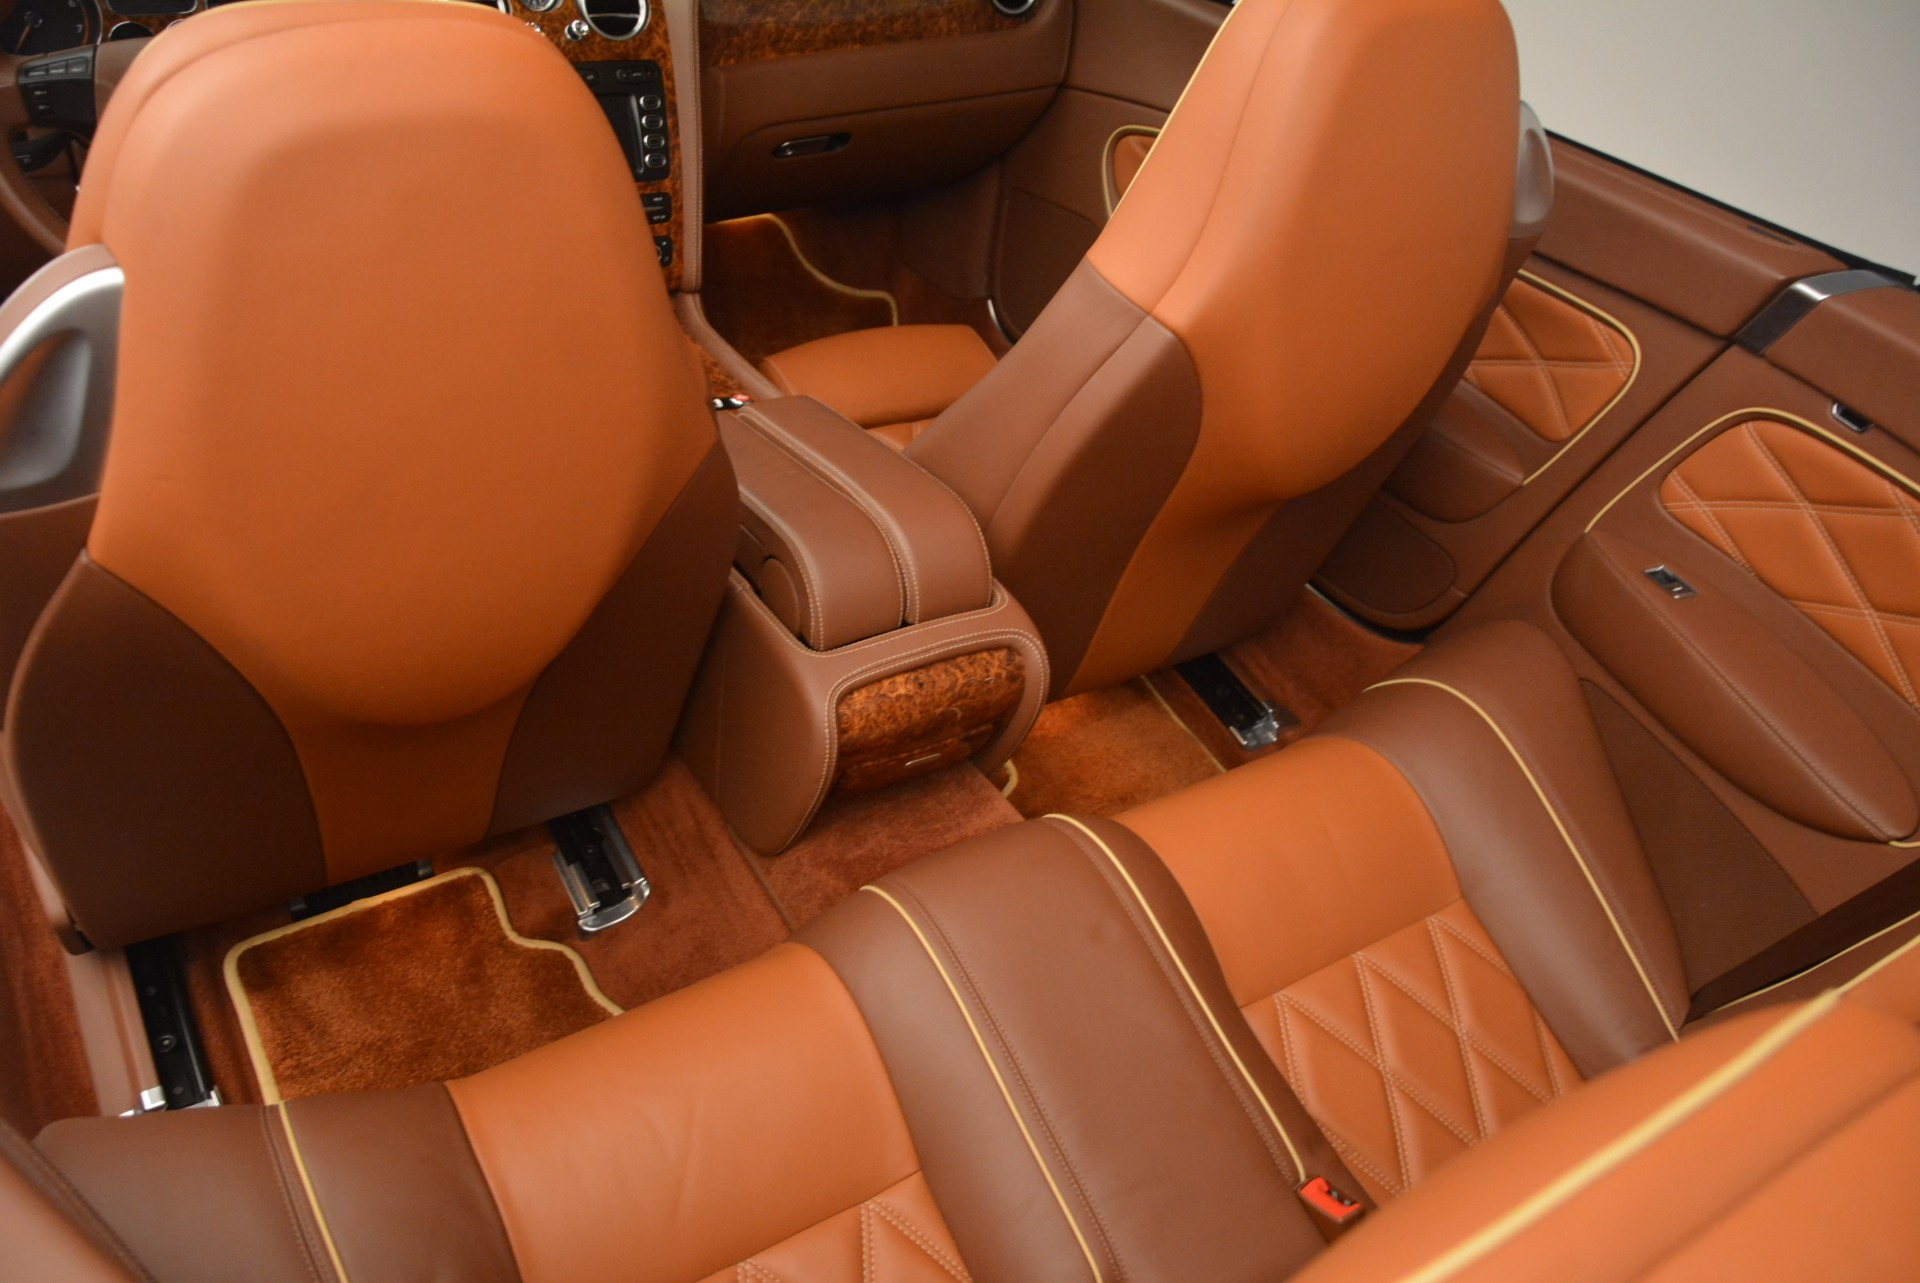 Used 2010 Bentley Continental GT Series 51 For Sale In Westport, CT 1222_p38